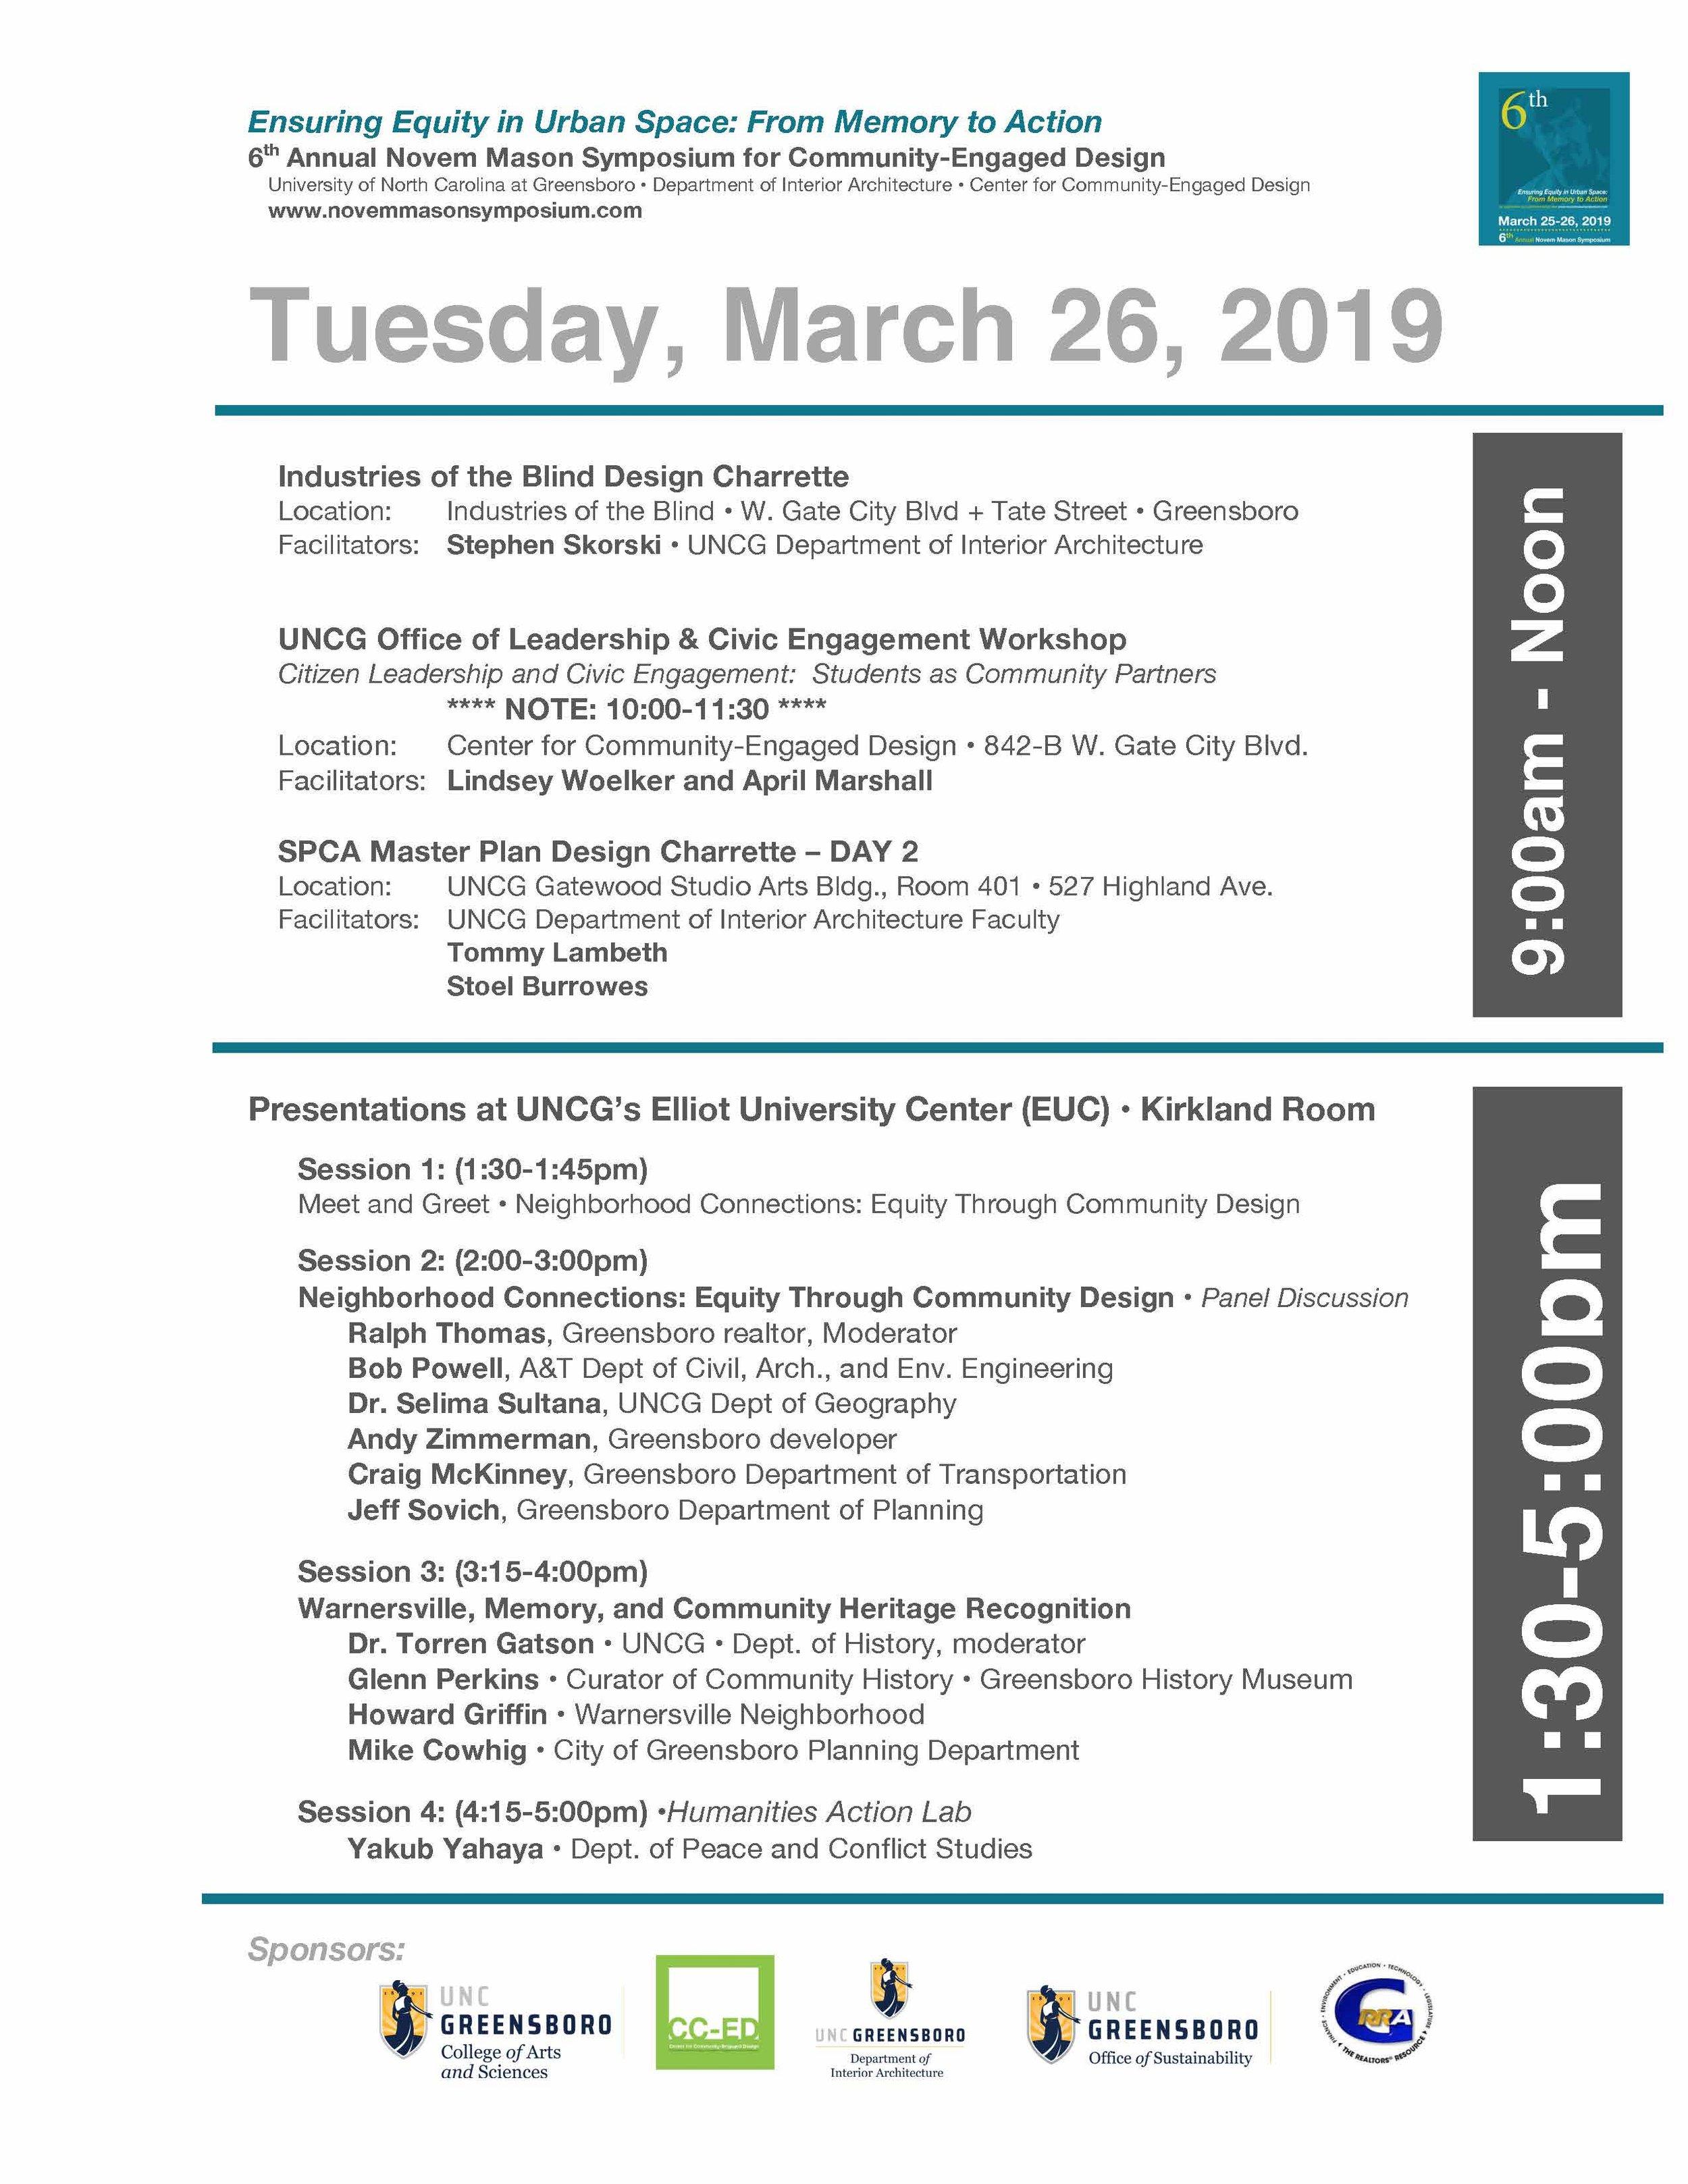 NMSsymposium-2019-3-22-19_Page_2.jpg